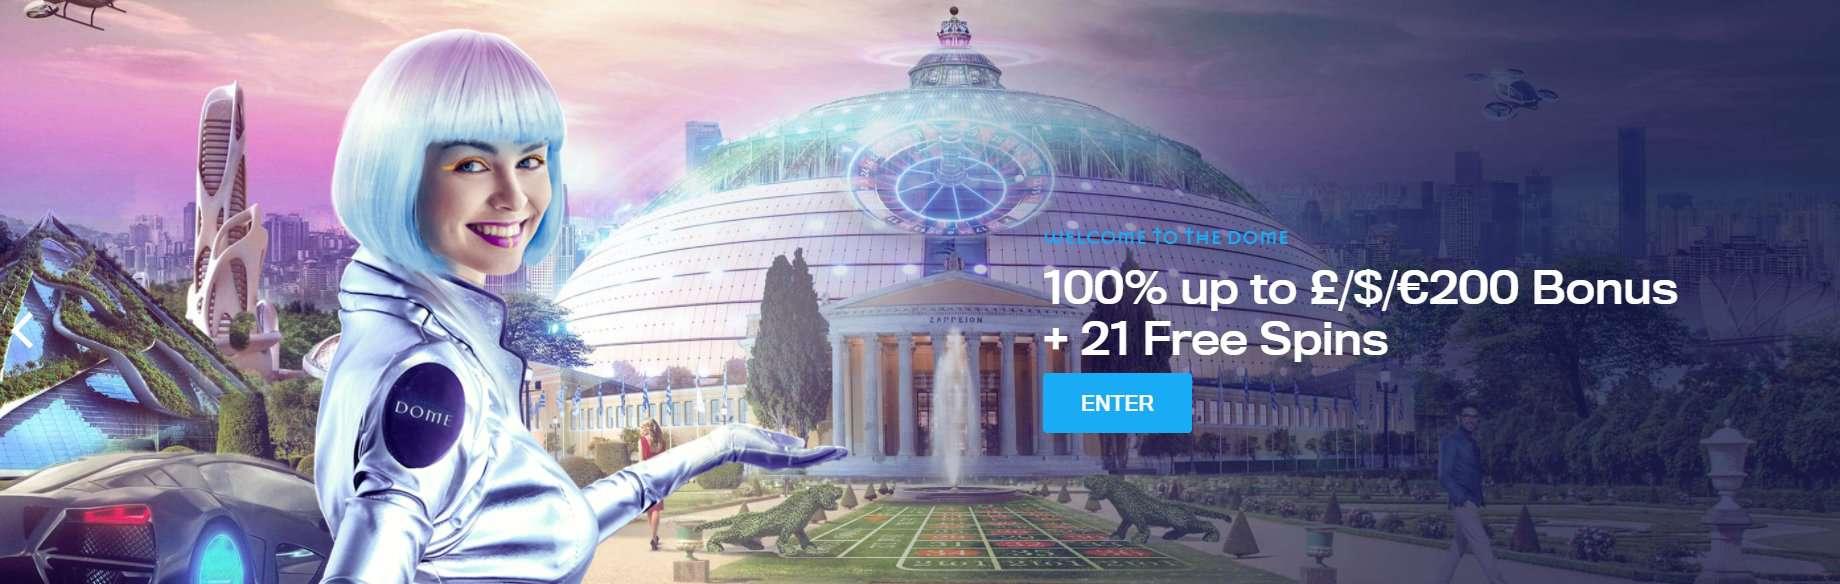 Casino Dome banner NOGP